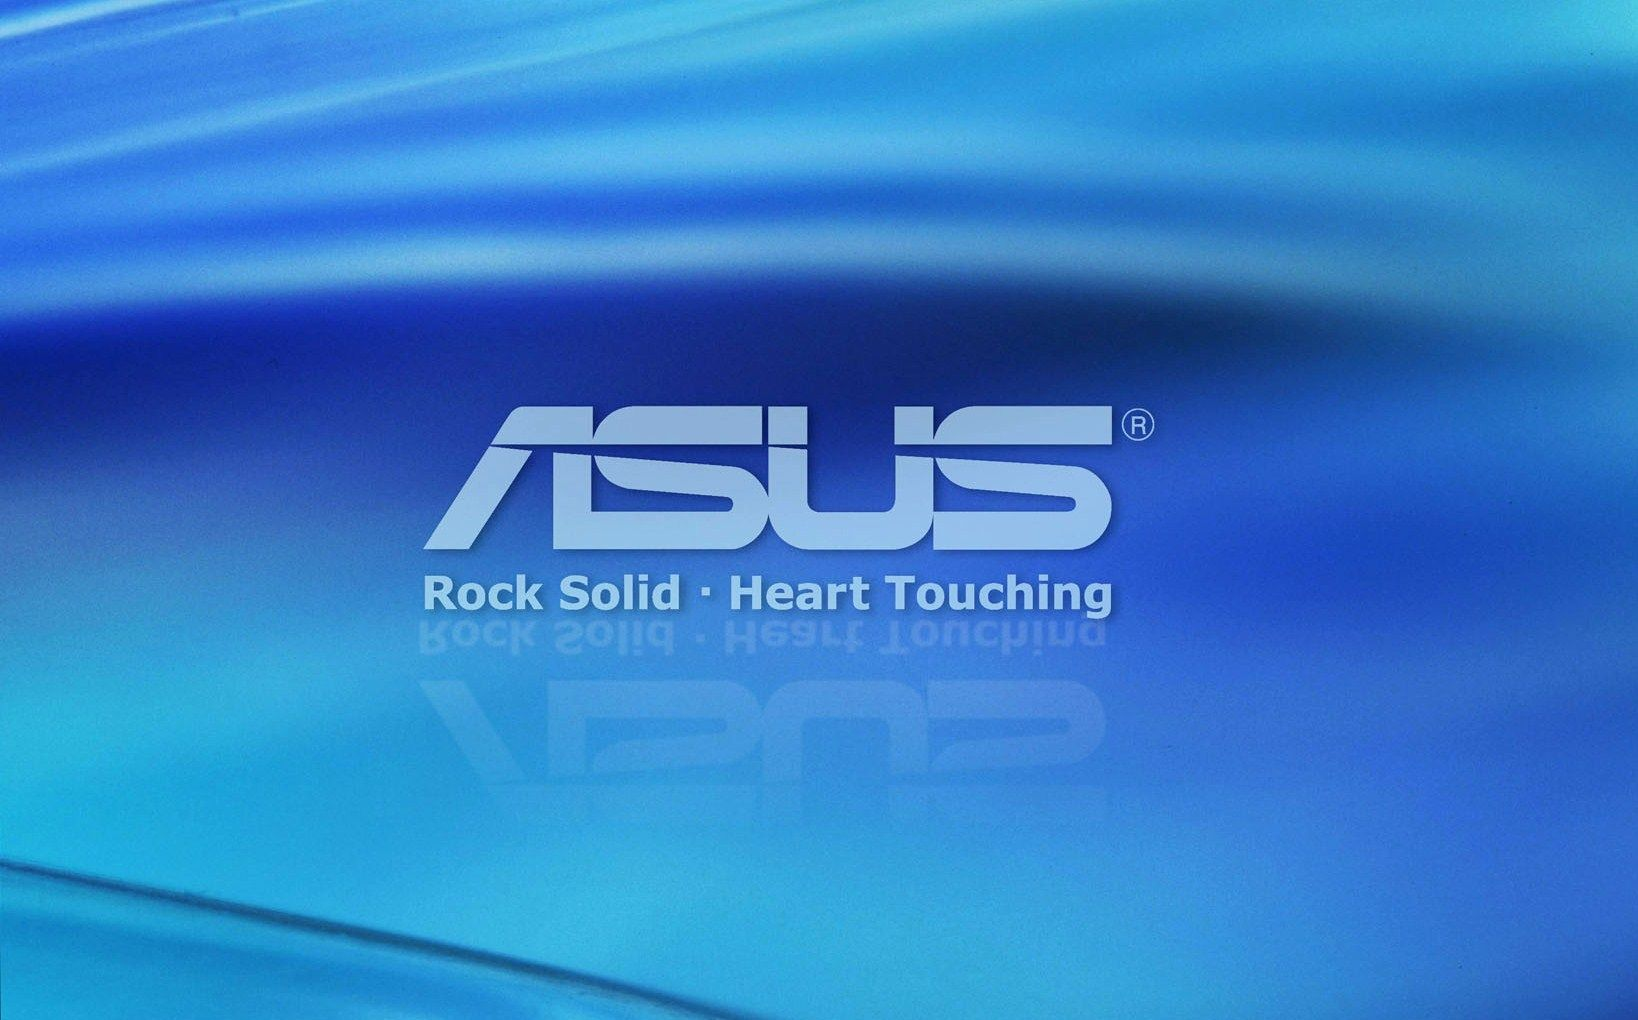 Asus Rog HD Wallpapers Download Free Republic Of Gamers 1638x1020 Hd Wallpaper 40